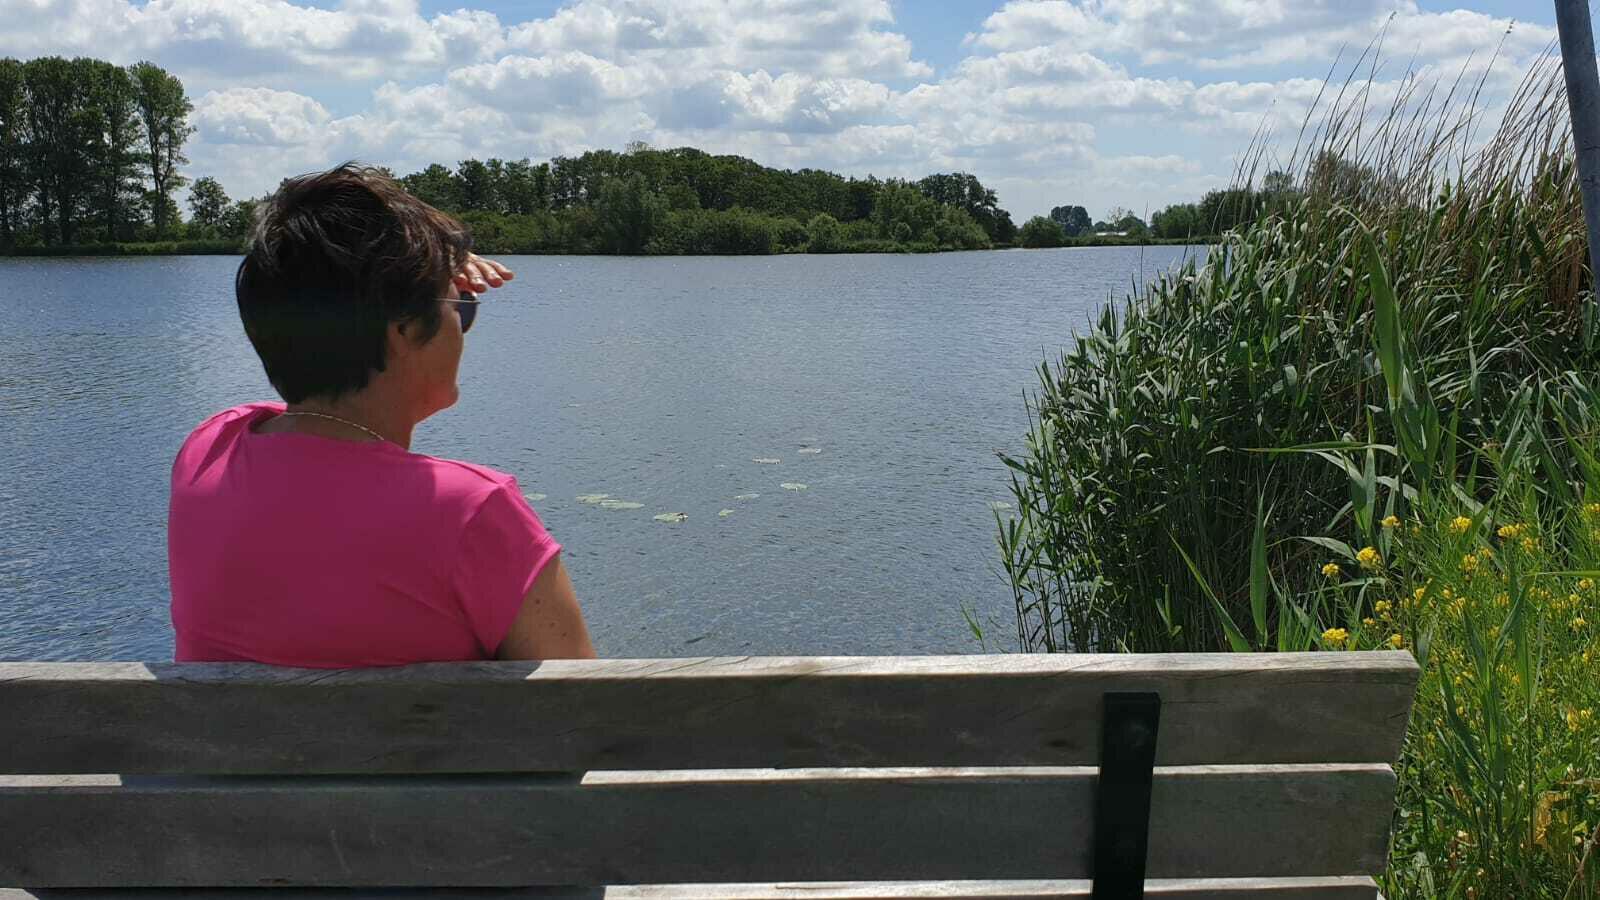 Zuid-Hollandse polder, Roelofarendsveen